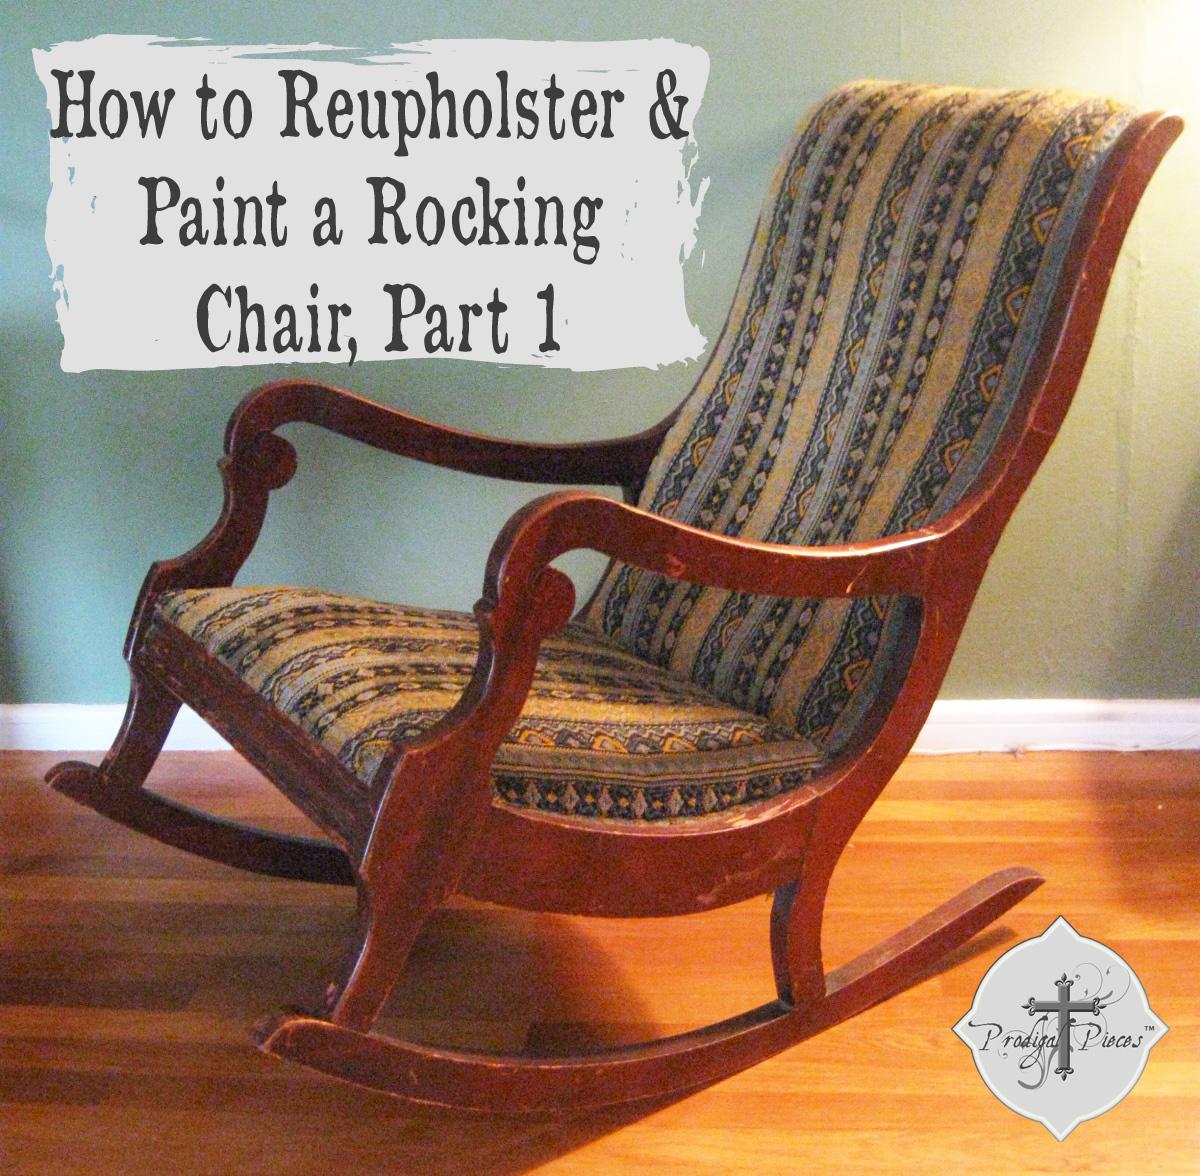 reupholster a rocking chair part 1 via Prodigal Pieces - How To Reupholster & Paint A Rocking Chair, Part 1 - Prodigal Pieces